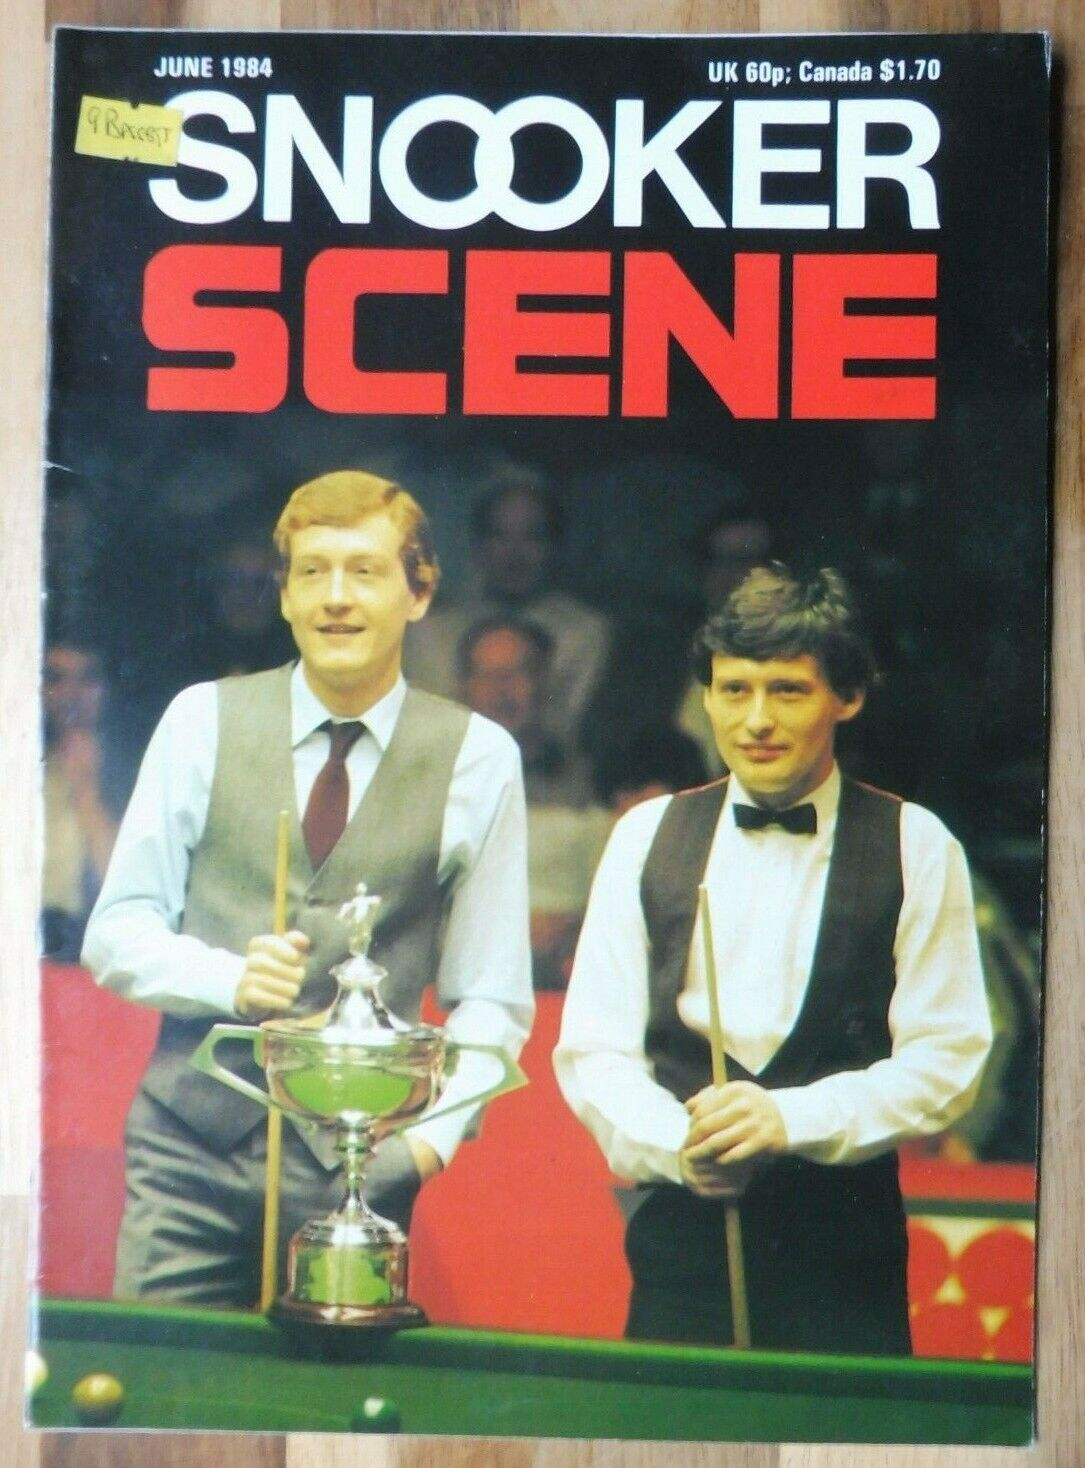 Snooker Scene Magazine, June 1984, Good Condition.